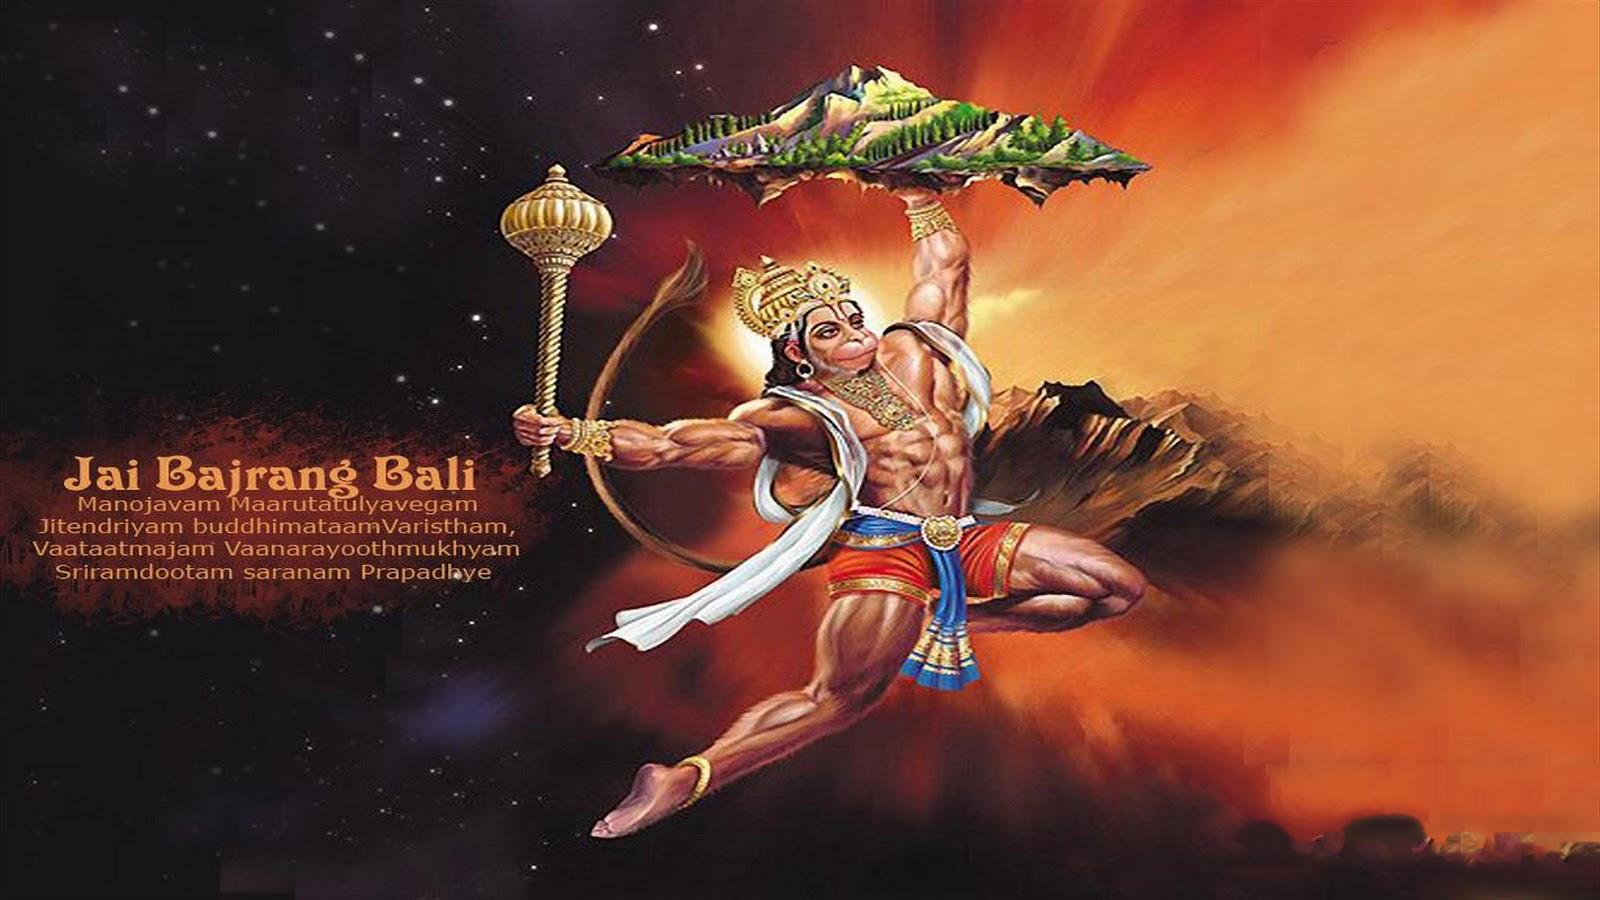 bajrang bali hanuman 3d wallpaper download free new wallpapers